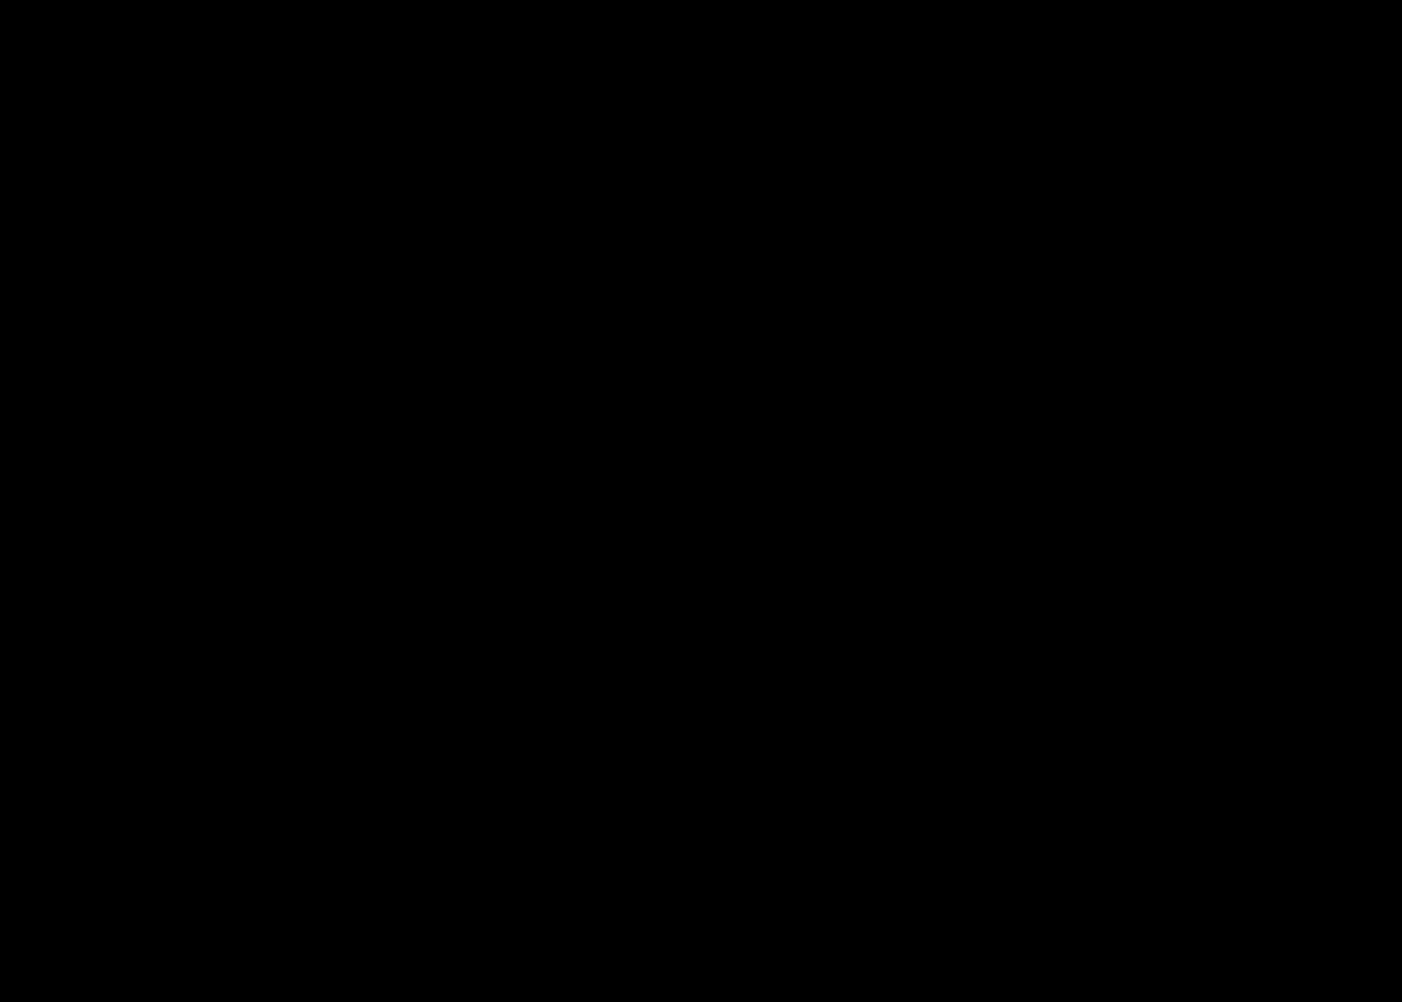 Youtube icon outline